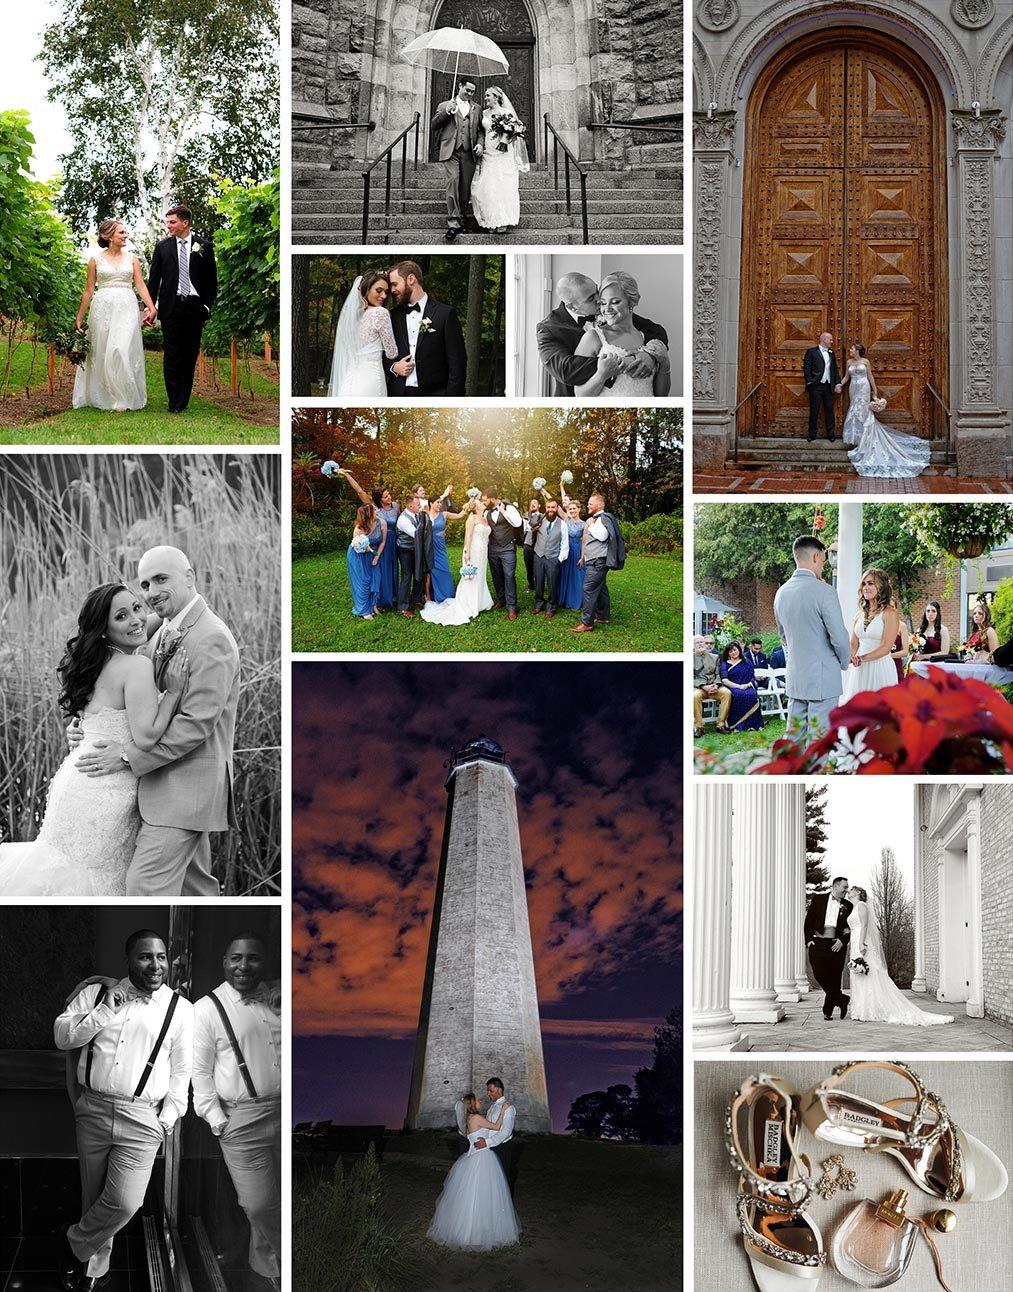 wedding gallery image 5